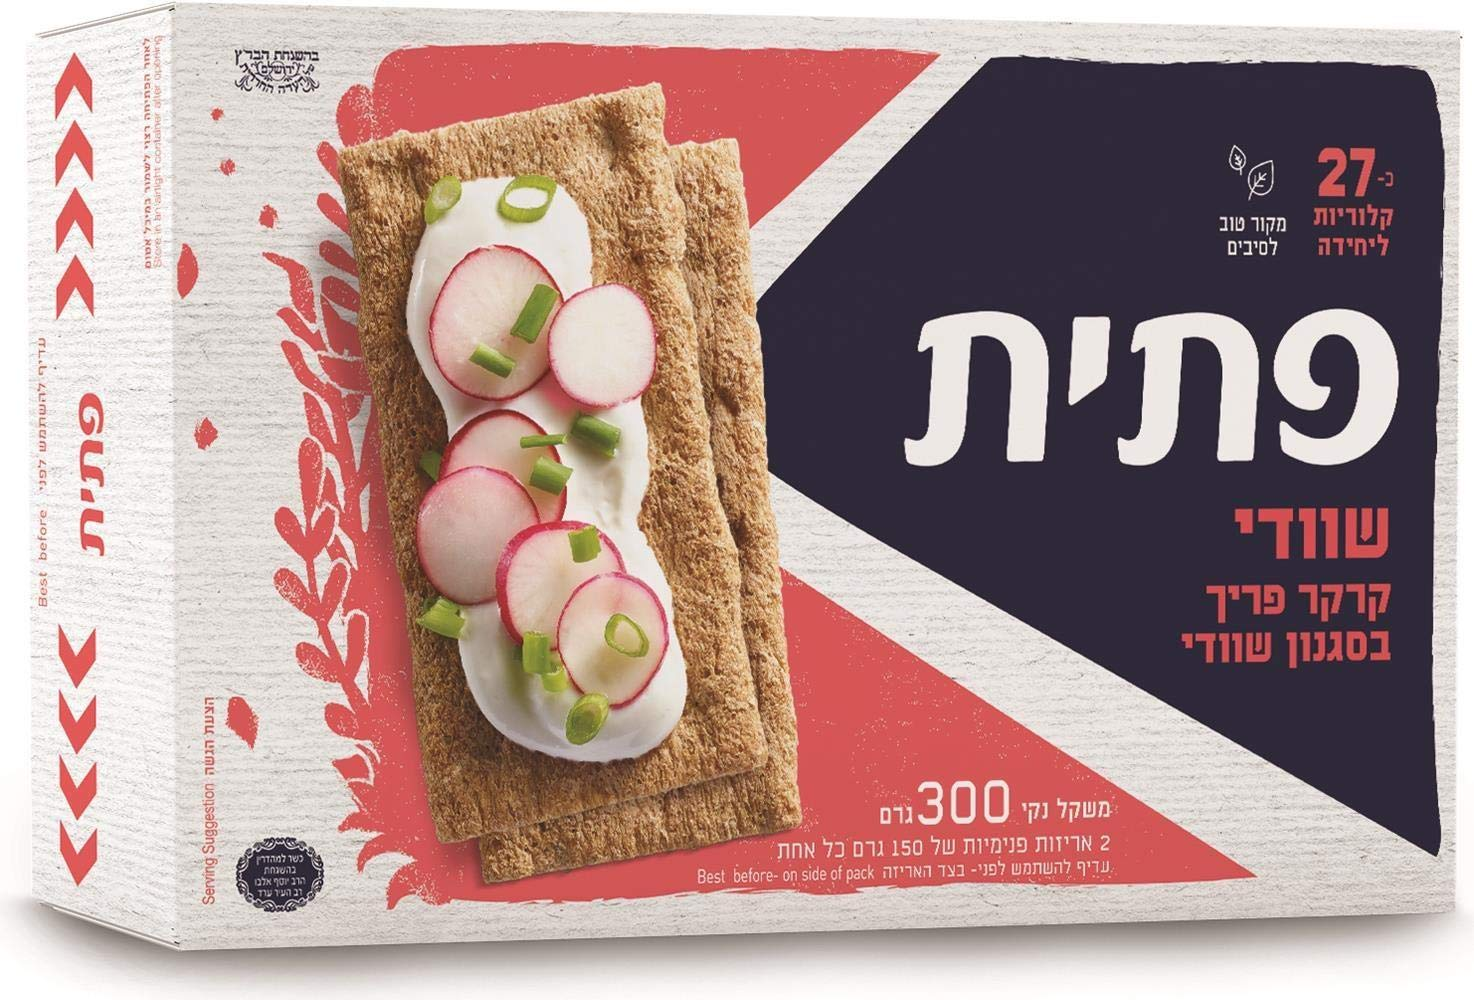 Patit Swedish Cereal Max 56% OFF Cracker Flake Snack Israel Kosher Telma Popular product By